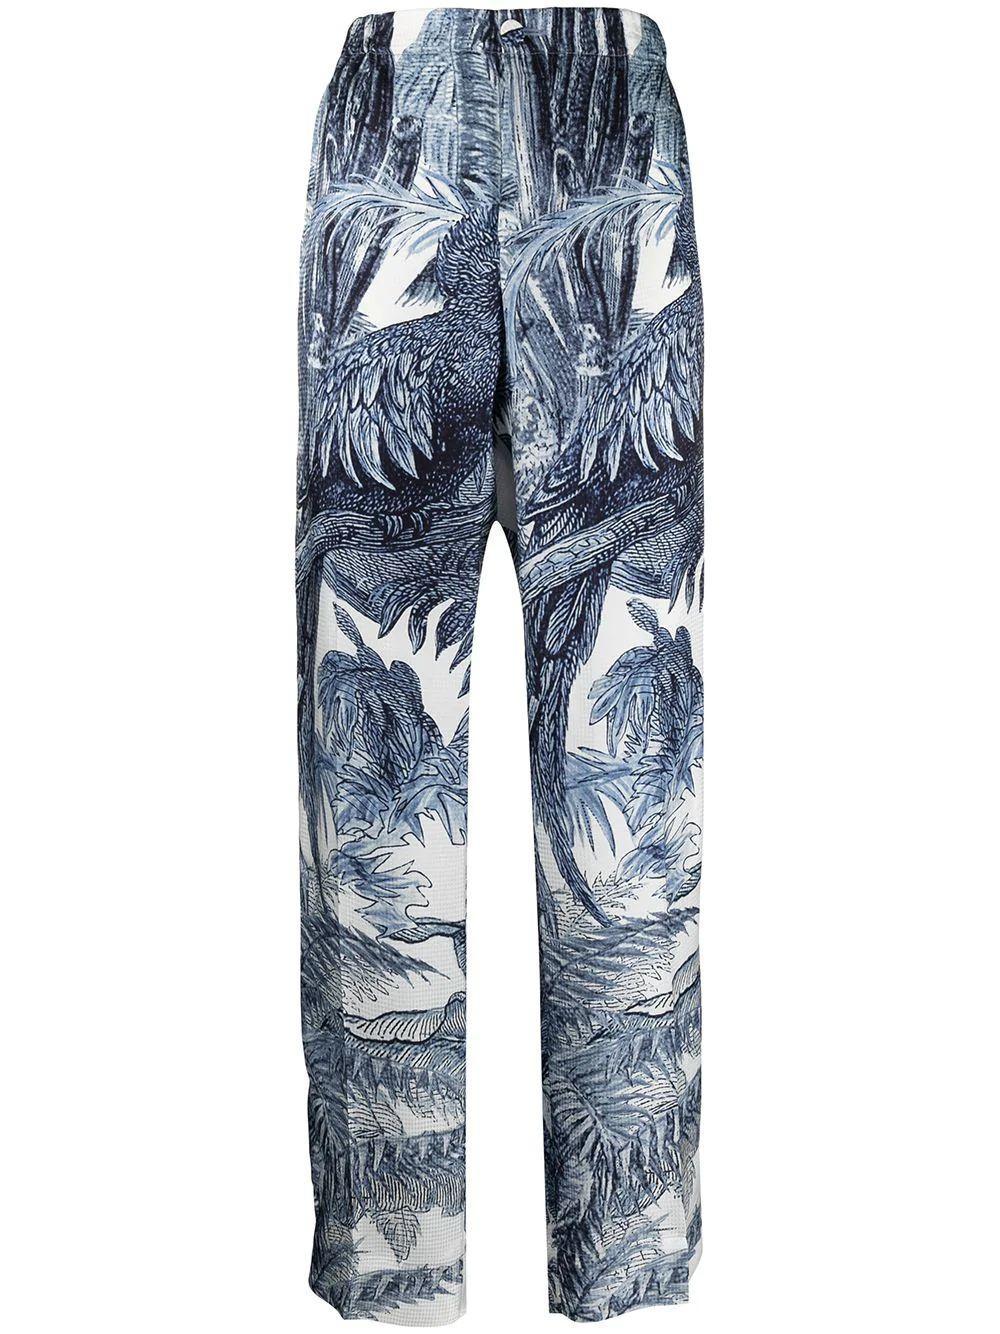 Etere Printed Pant